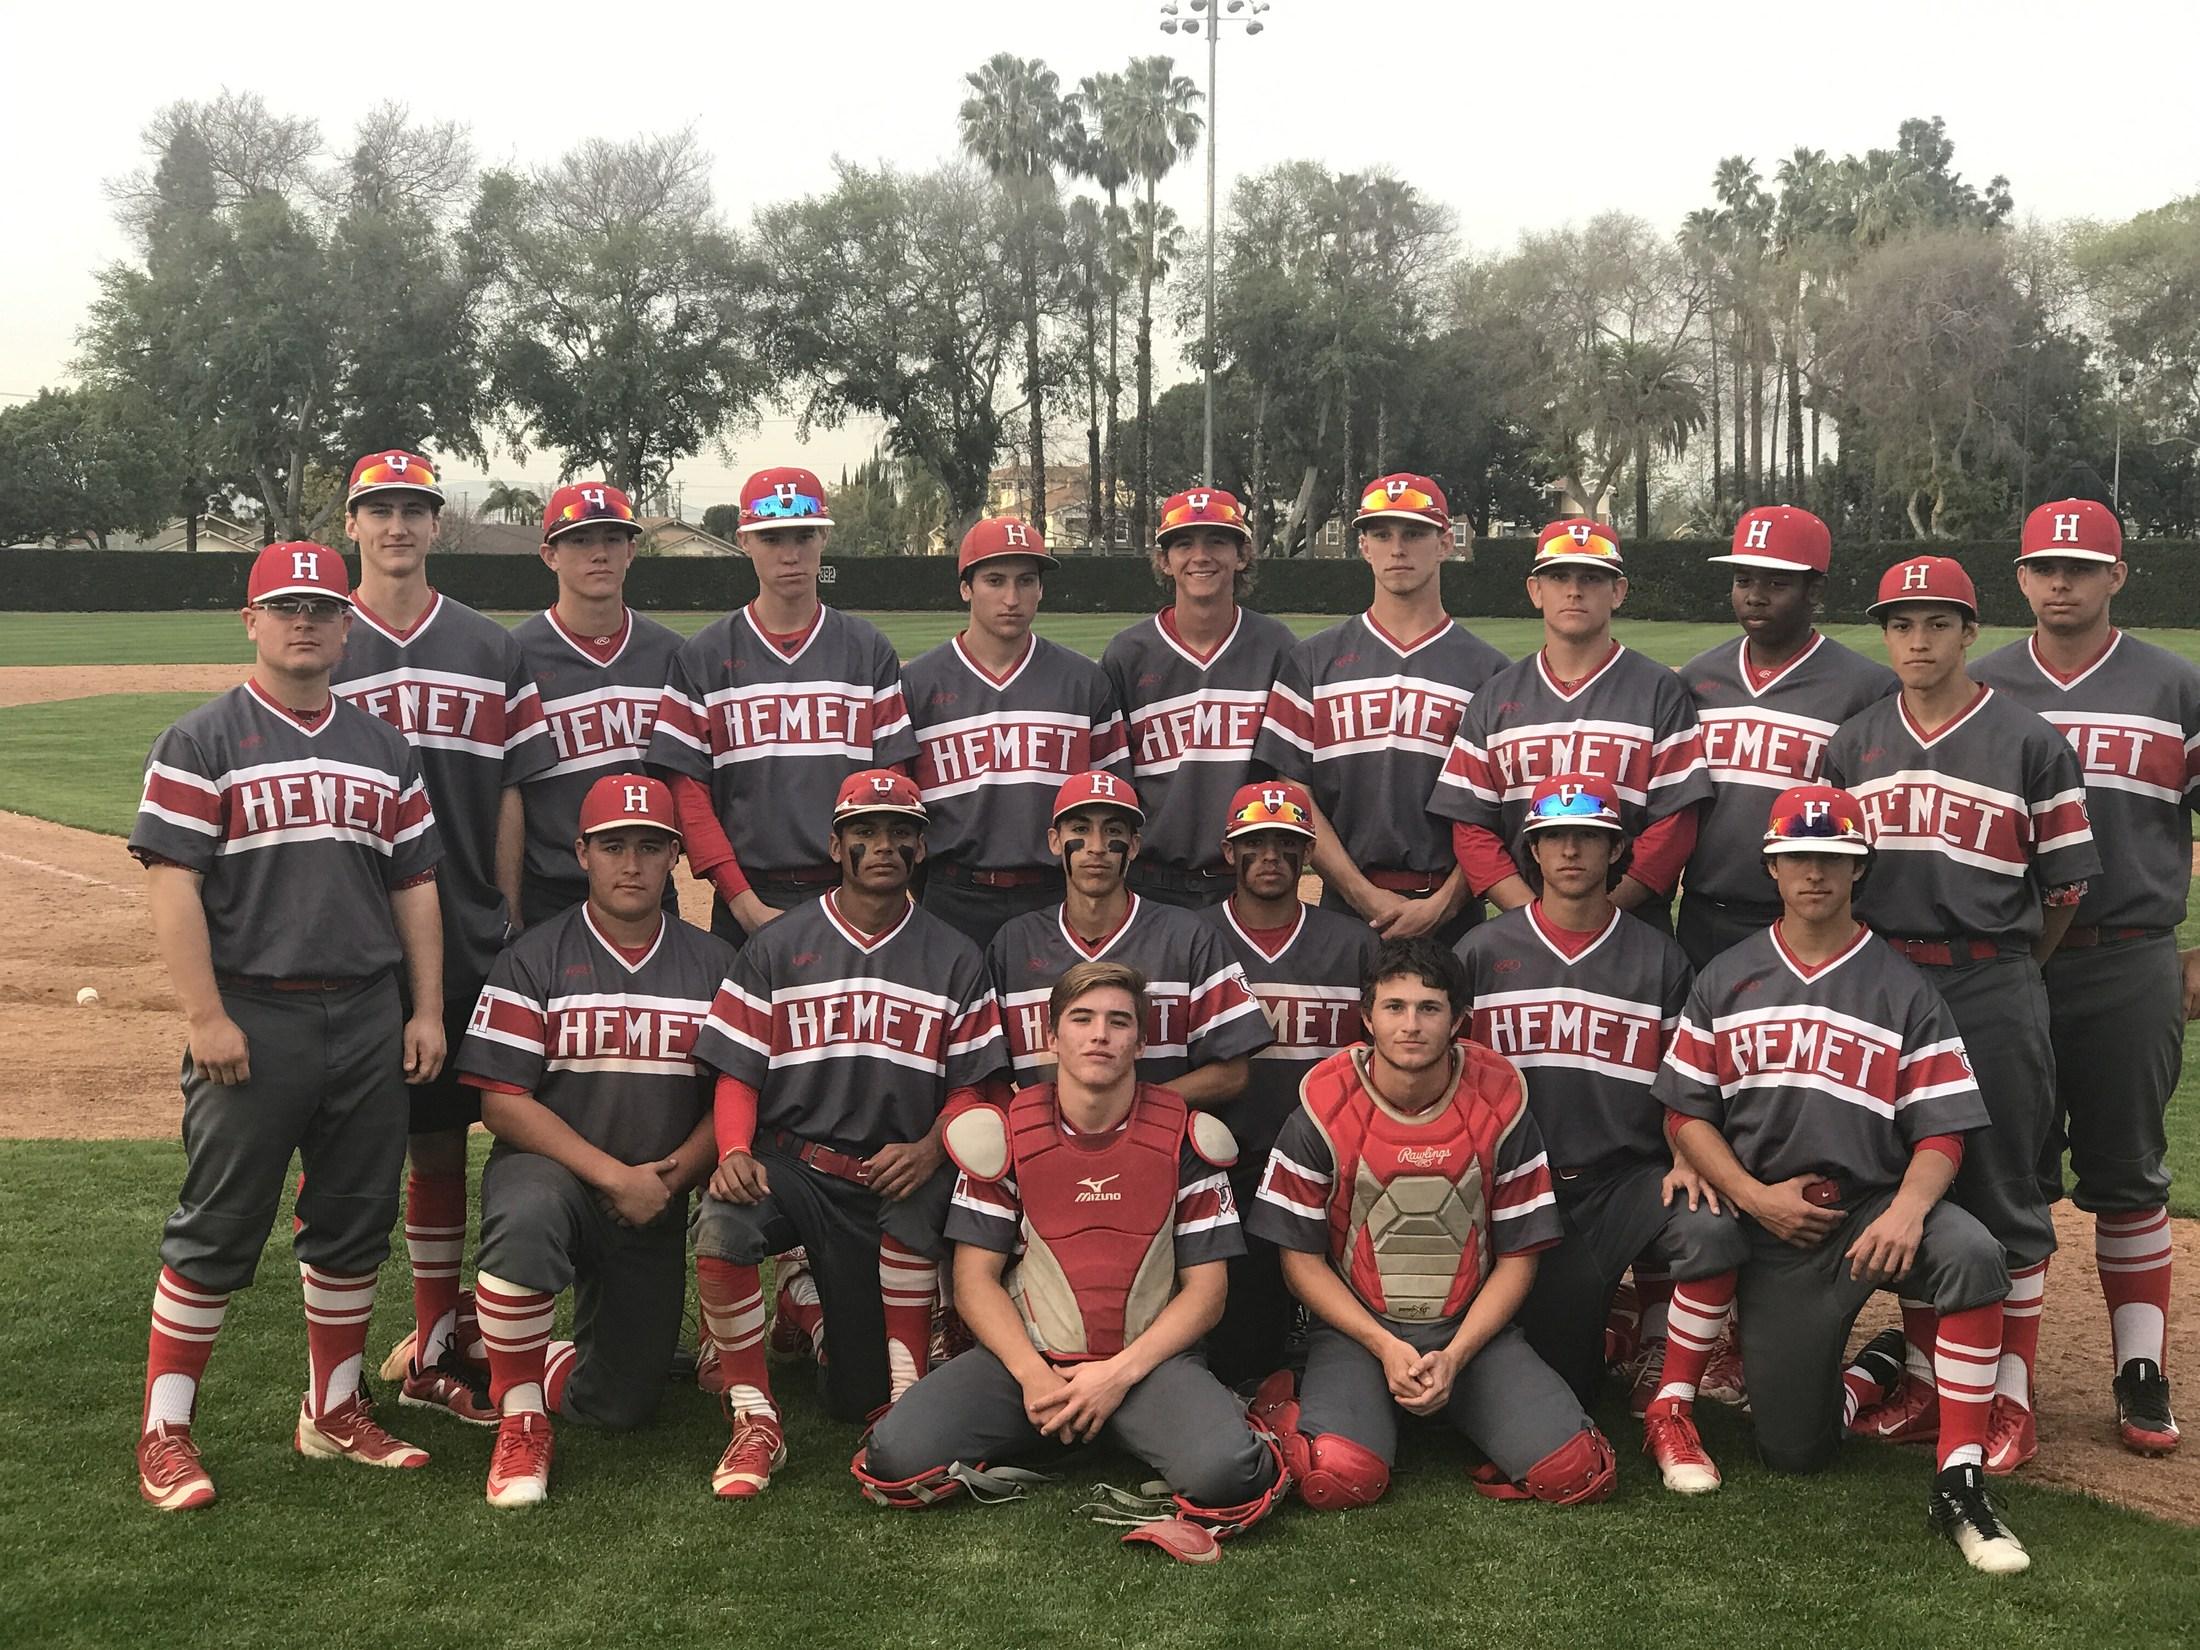 2017 Bulldogs - Newport Elks Costa Mesa Division Champs!